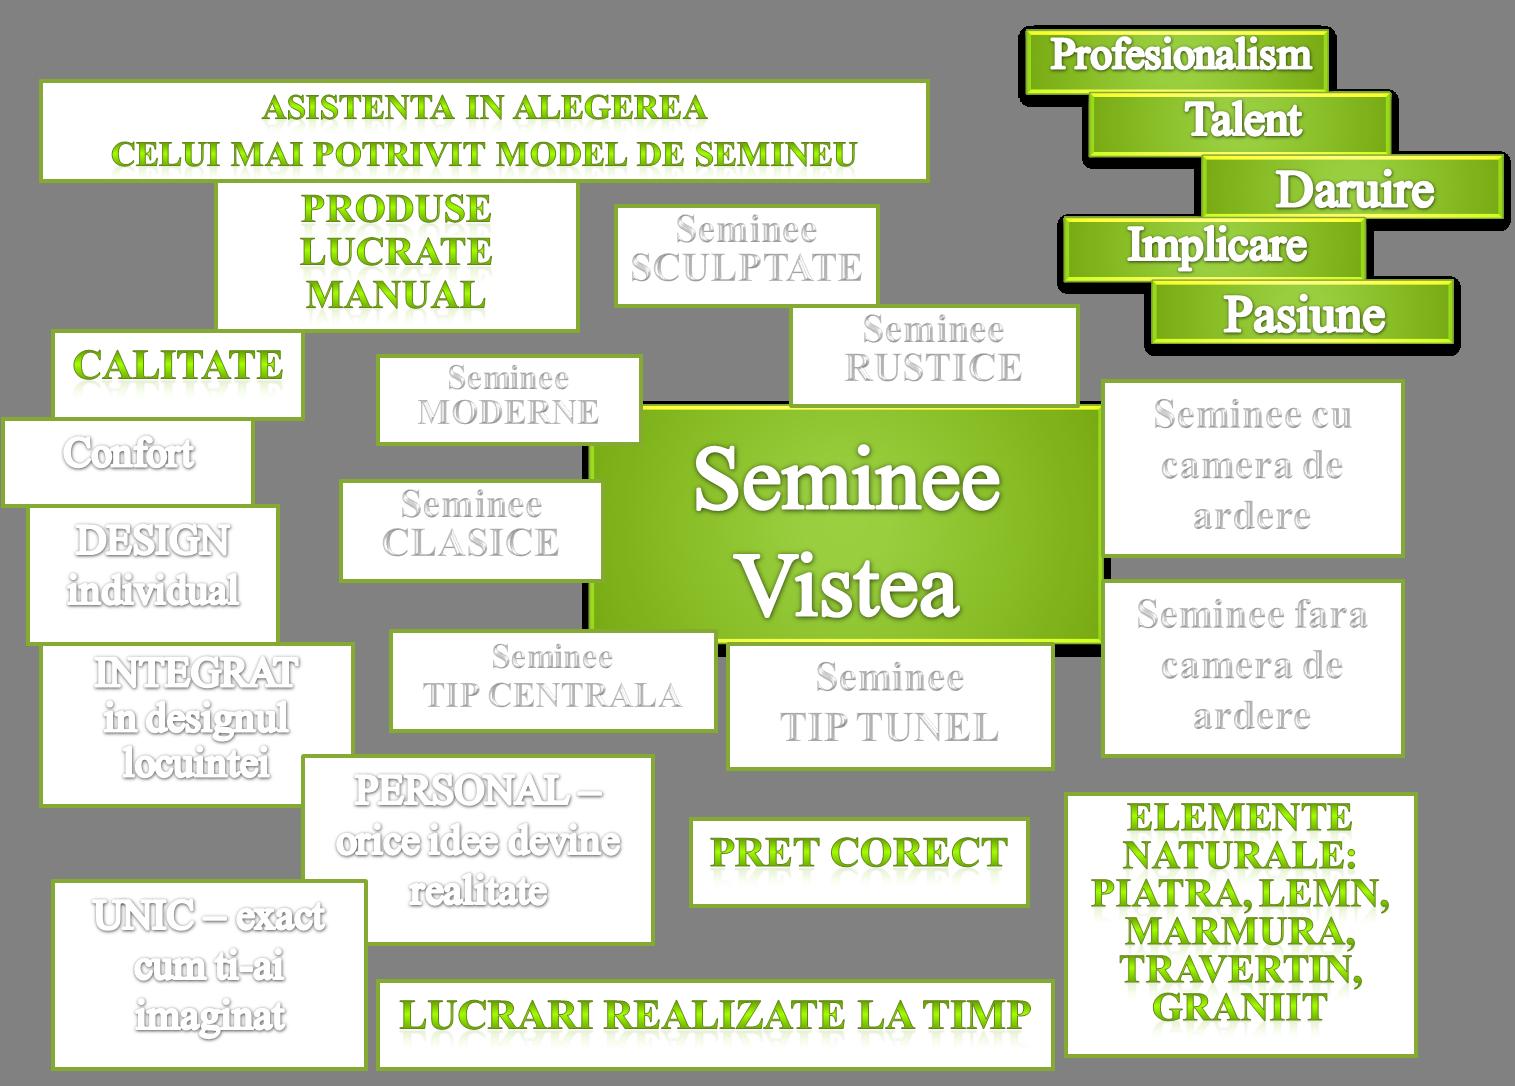 calitate, stil, personalitate, confort, durabilitate, rezistenta, asistenta, talent, profesionalism, daruire, implicare